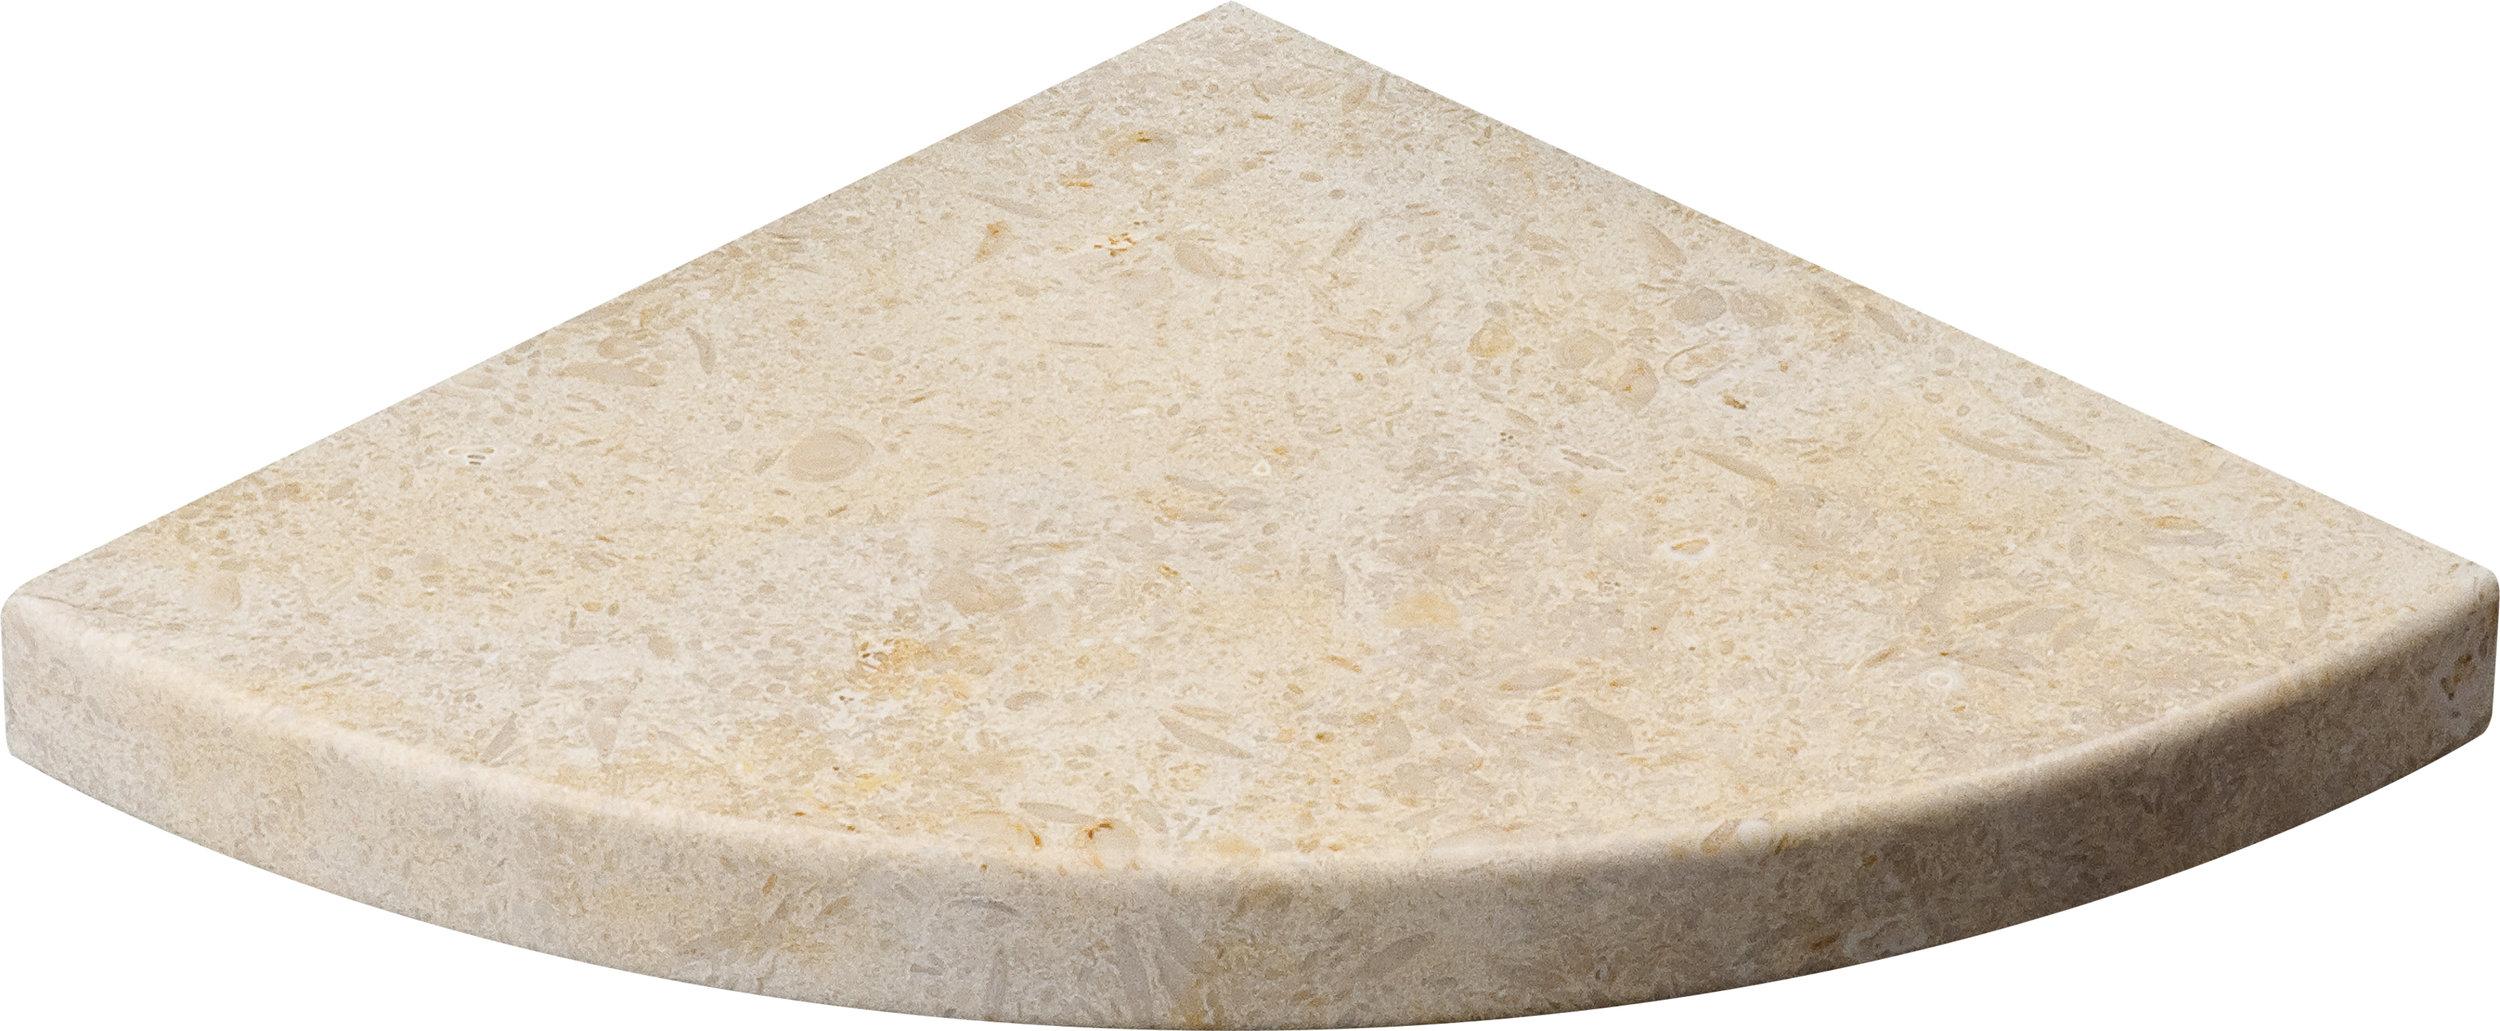 "SP00627 seashell honed corner shelf 8""x8""x3/4"""